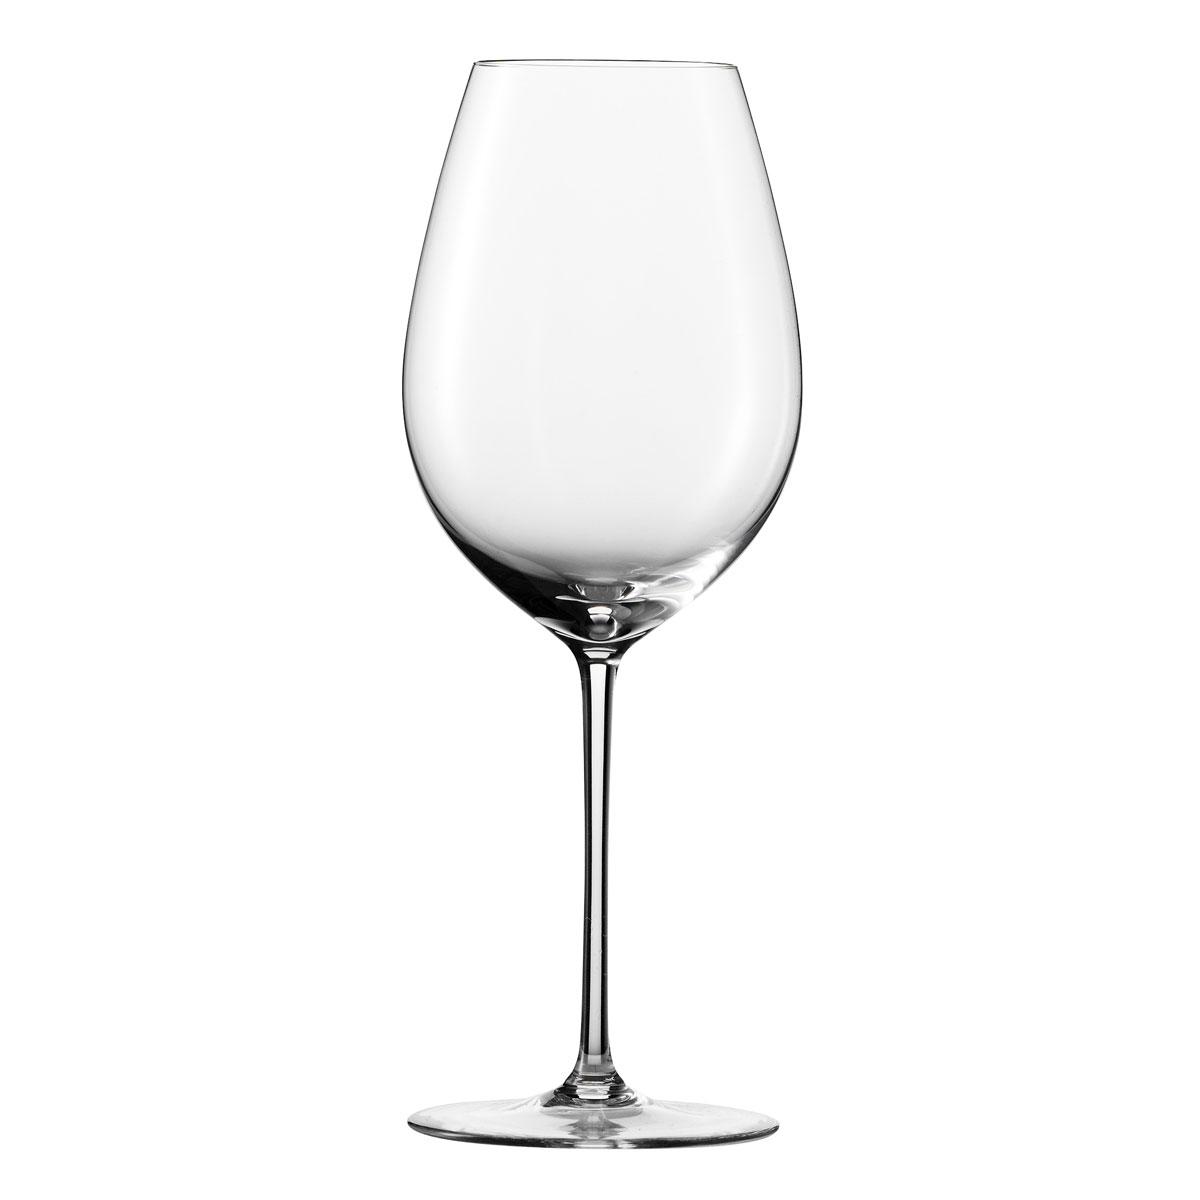 Schott Zwiesel Tritan Crystal, 1872 Enoteca Rioja, Single